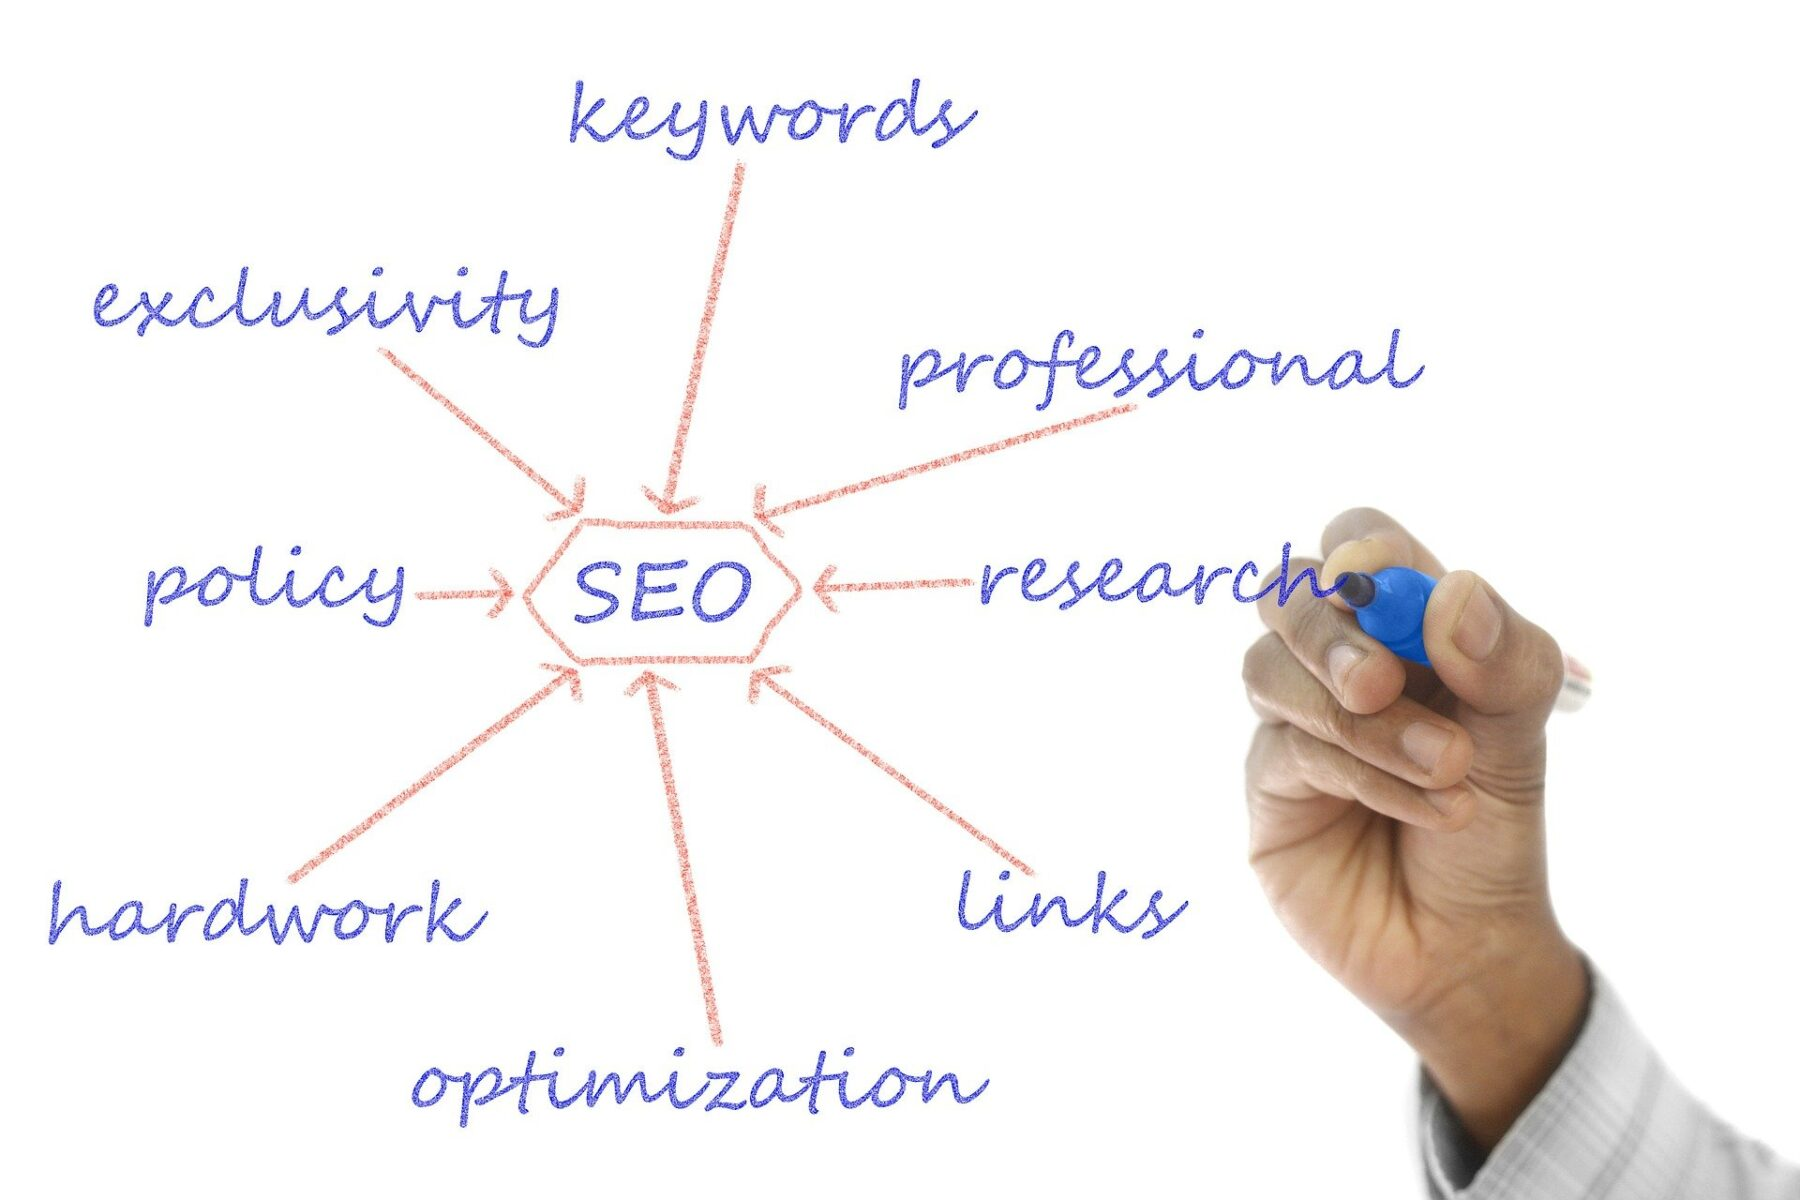 keywords, seo, keyword phrases